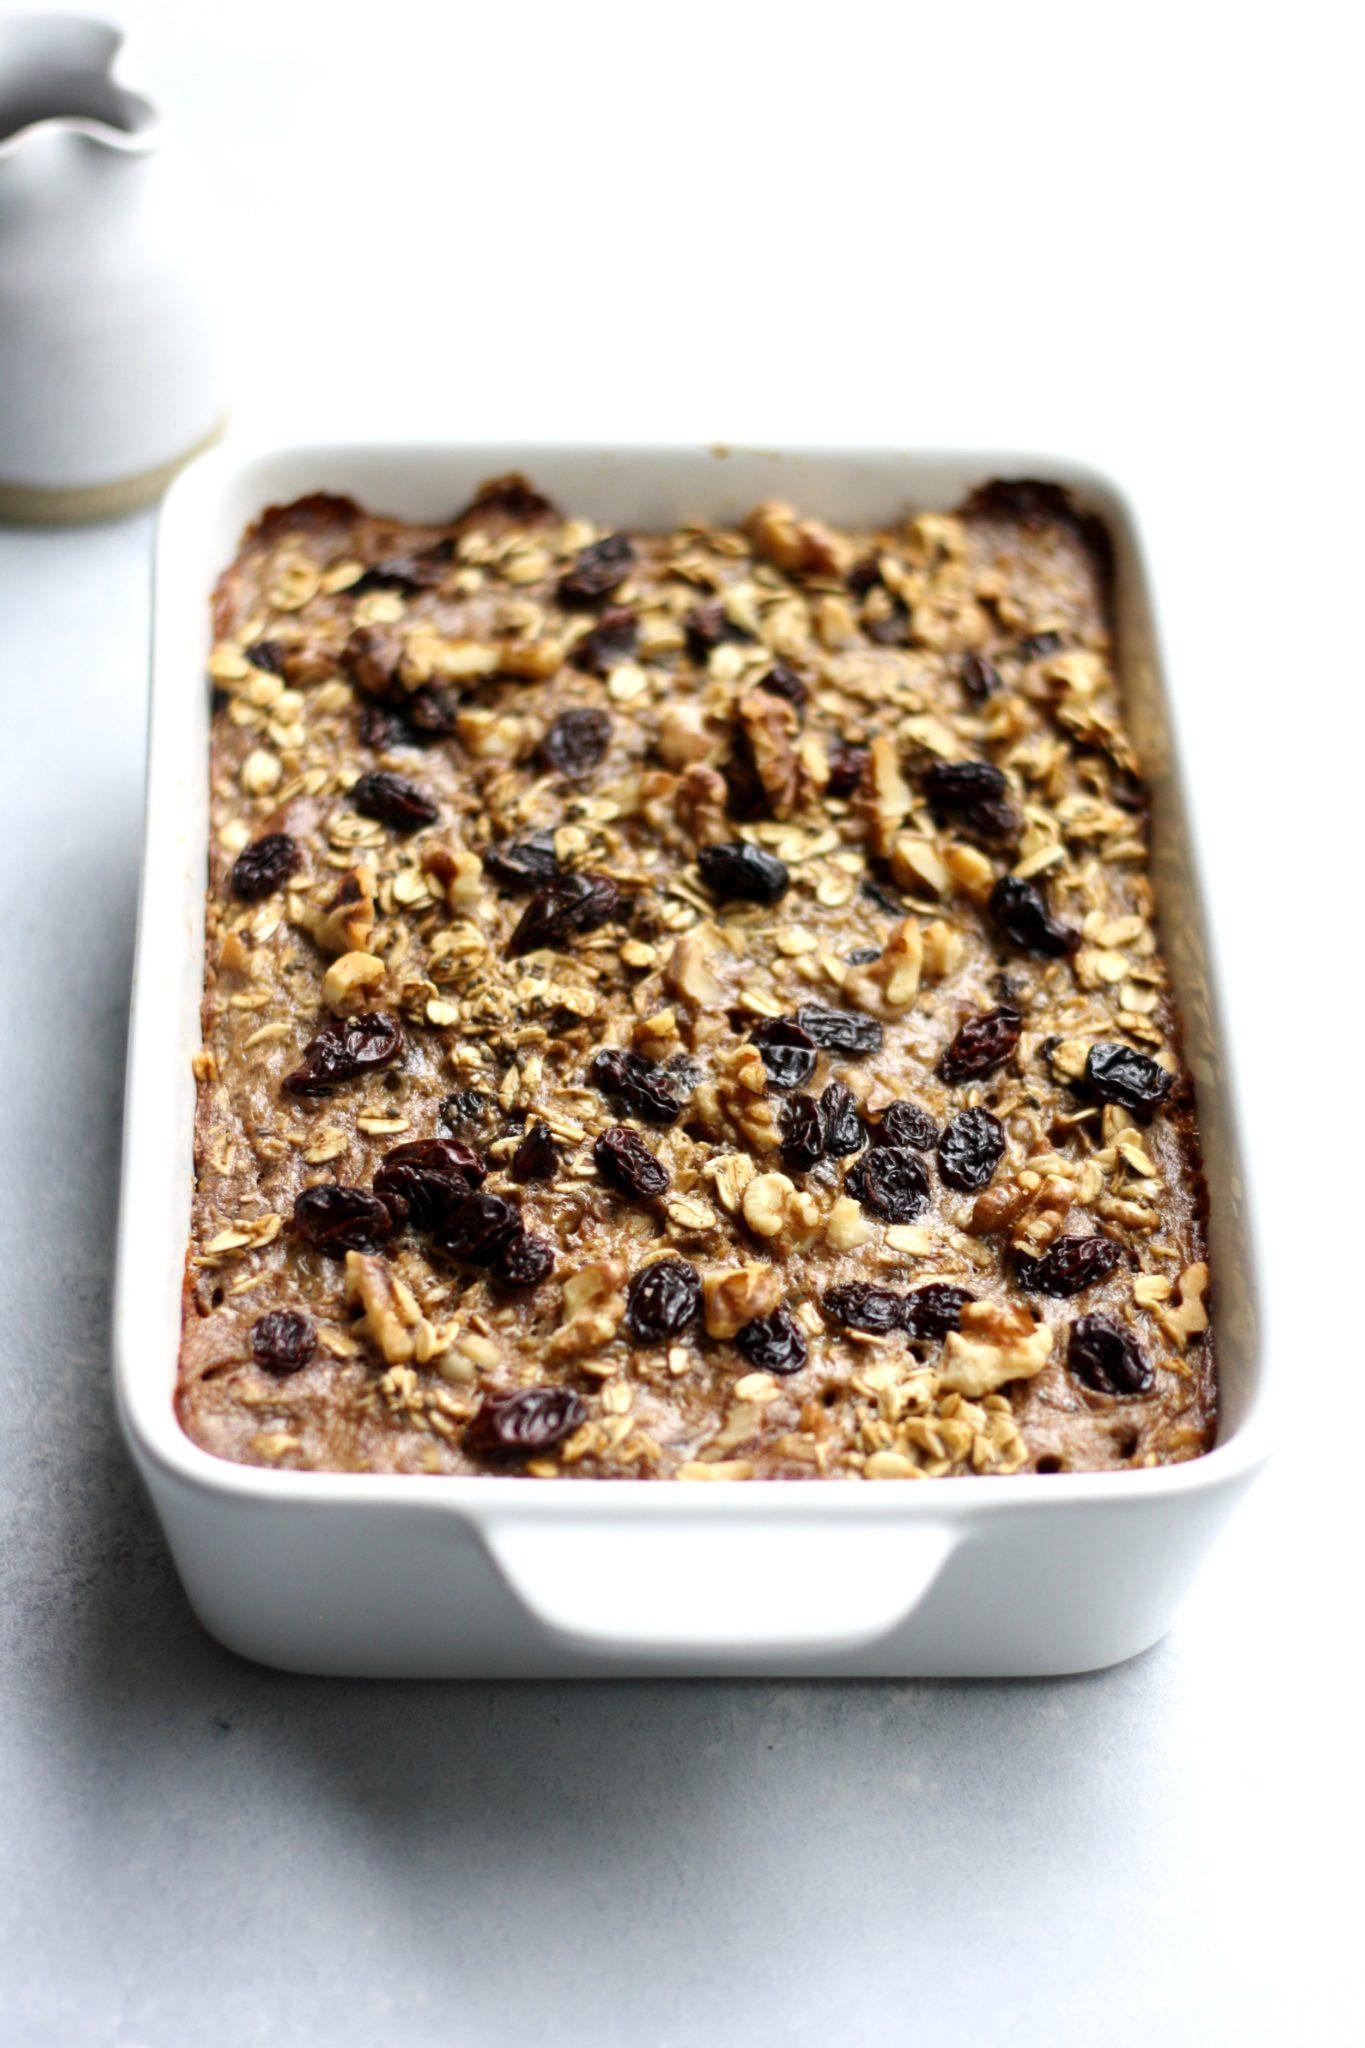 cinnamon raisin walnut baked oatmeal // cait's plate